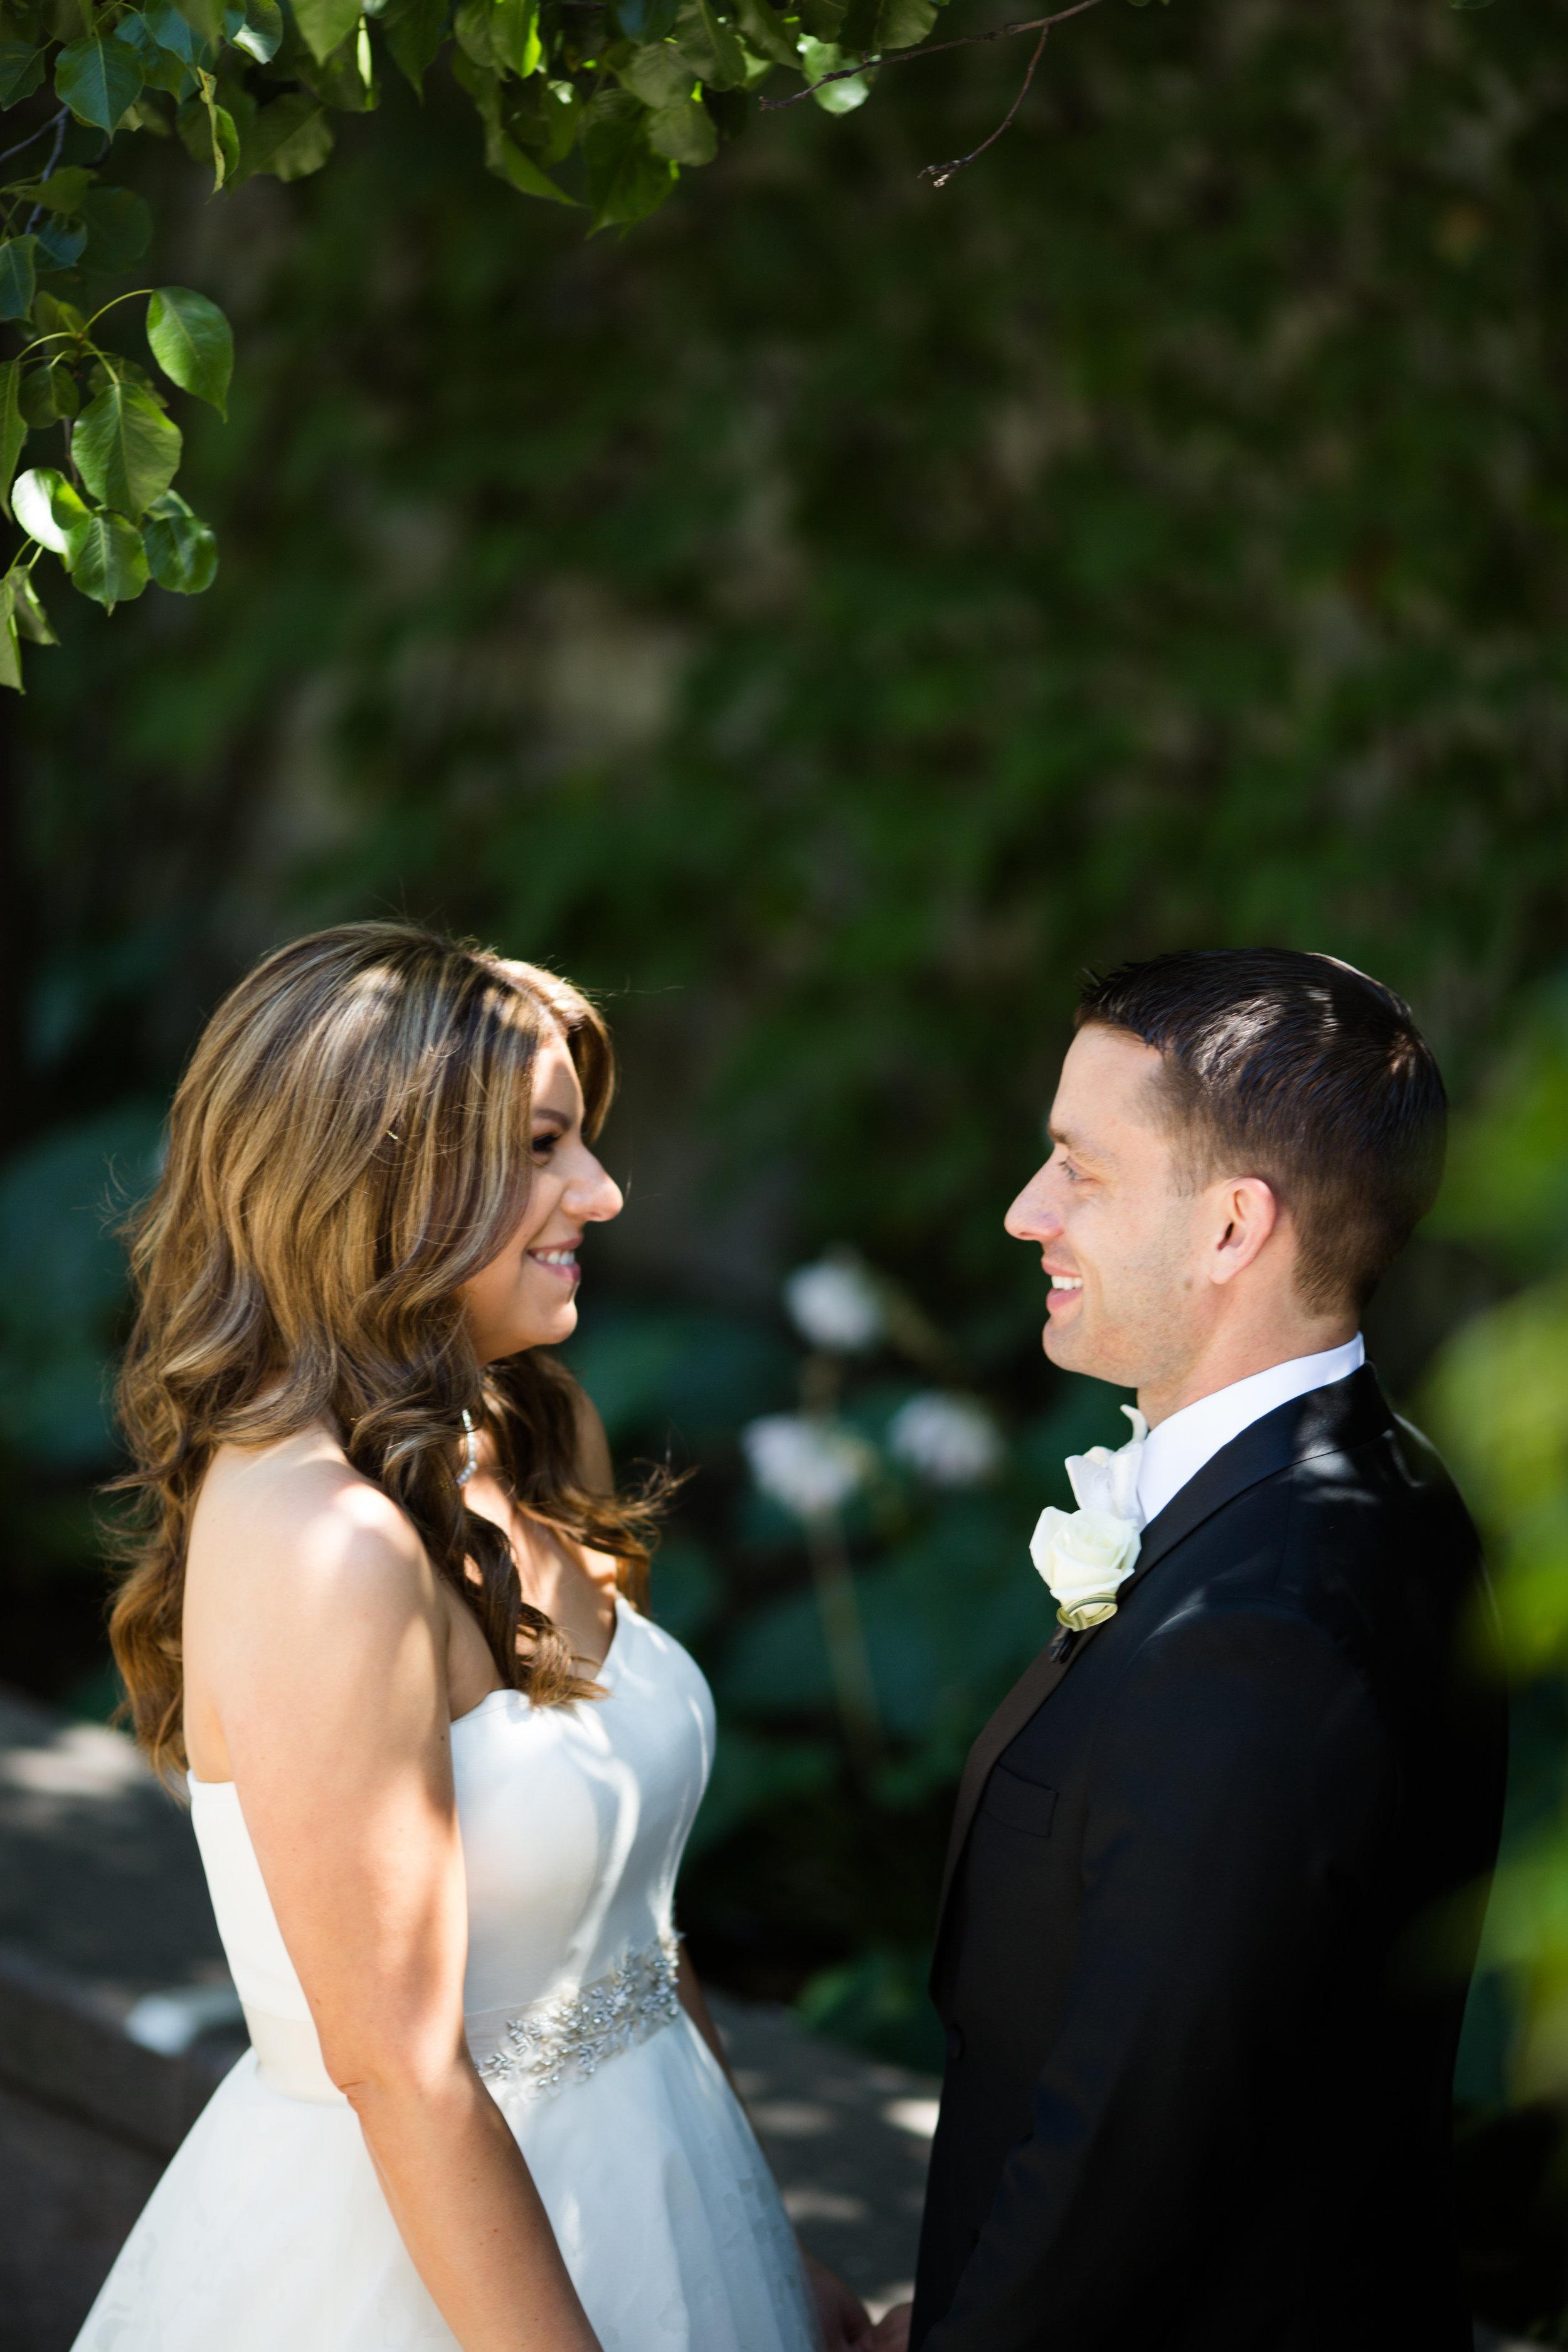 Chicago Wedding in the Summer